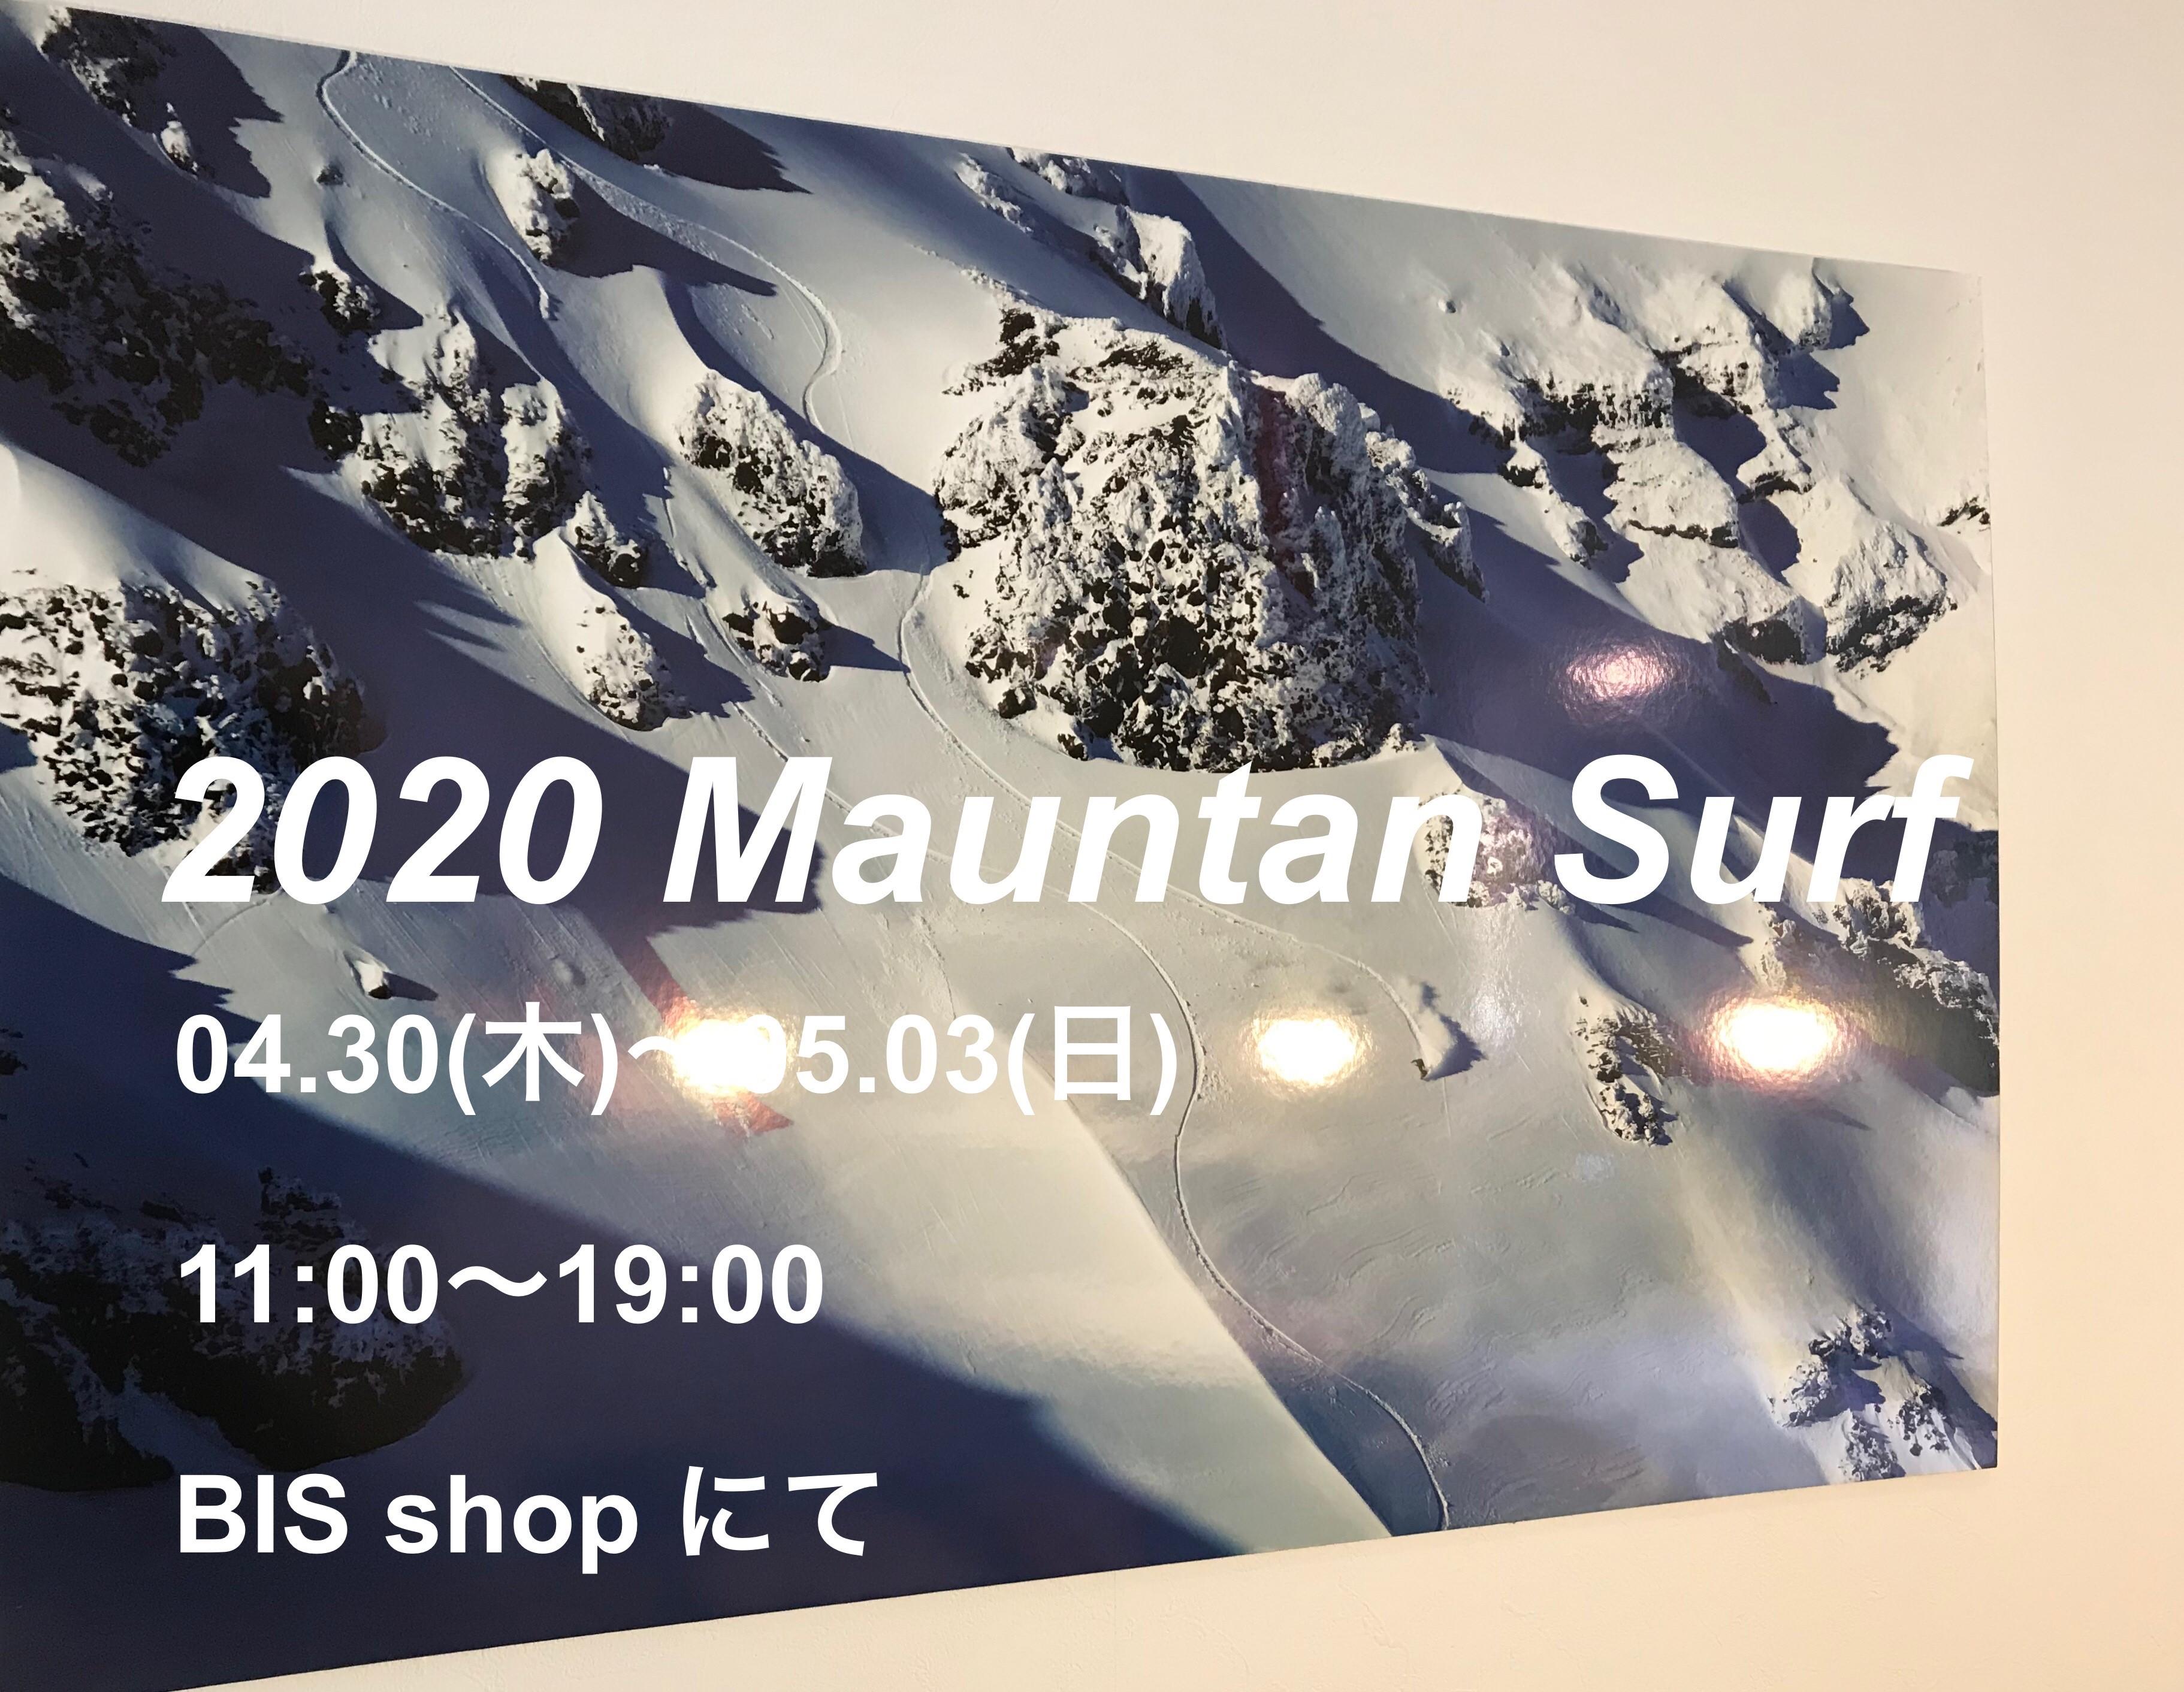 Mauntan Surf 展示会